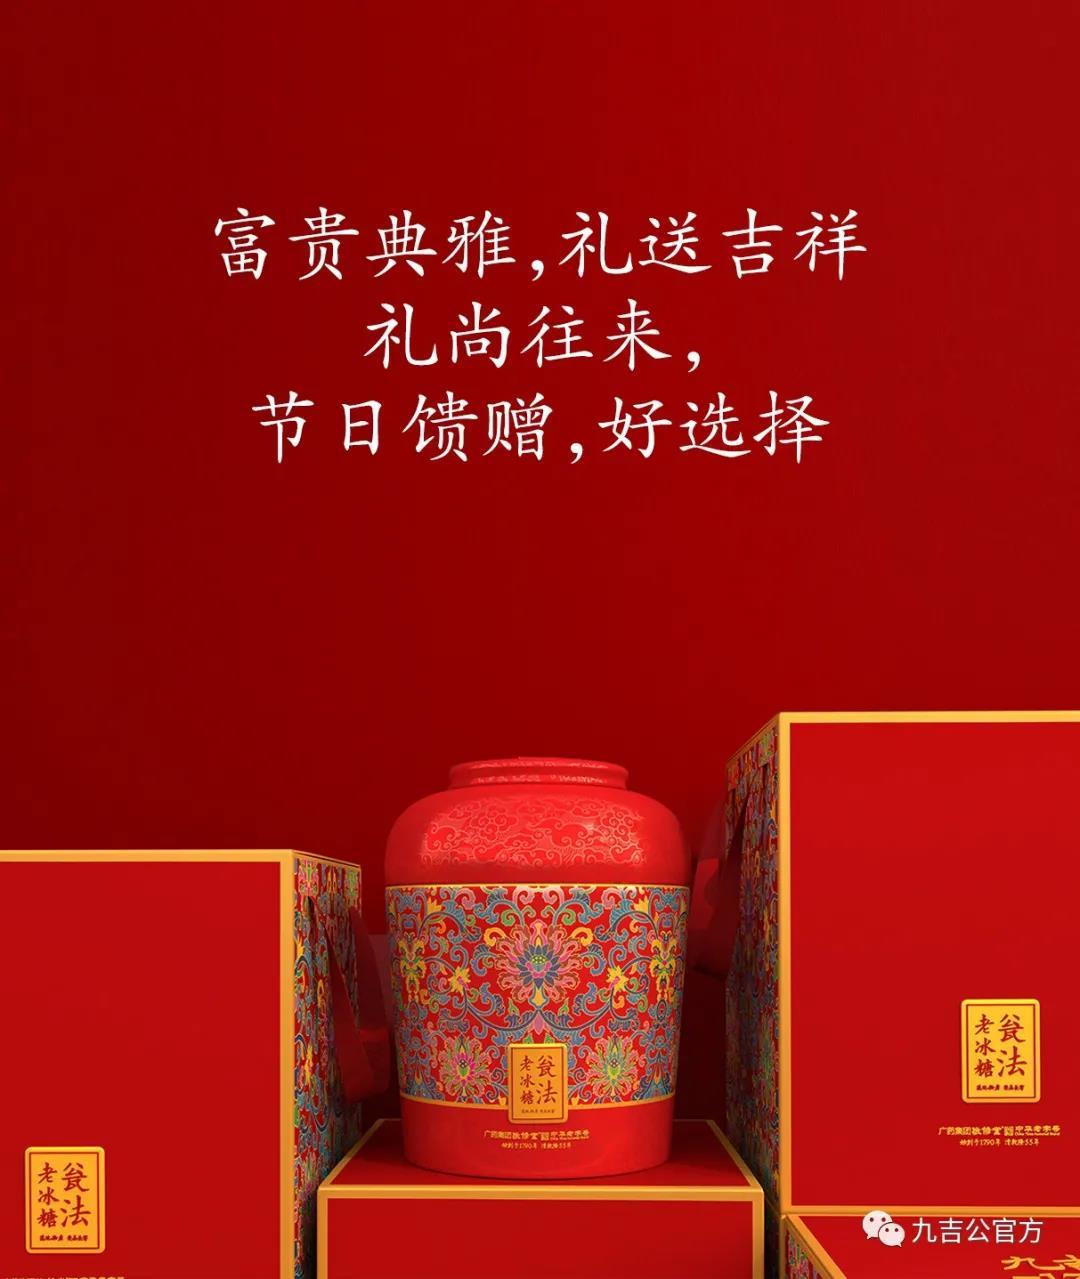 WeChat Image 20210708202343